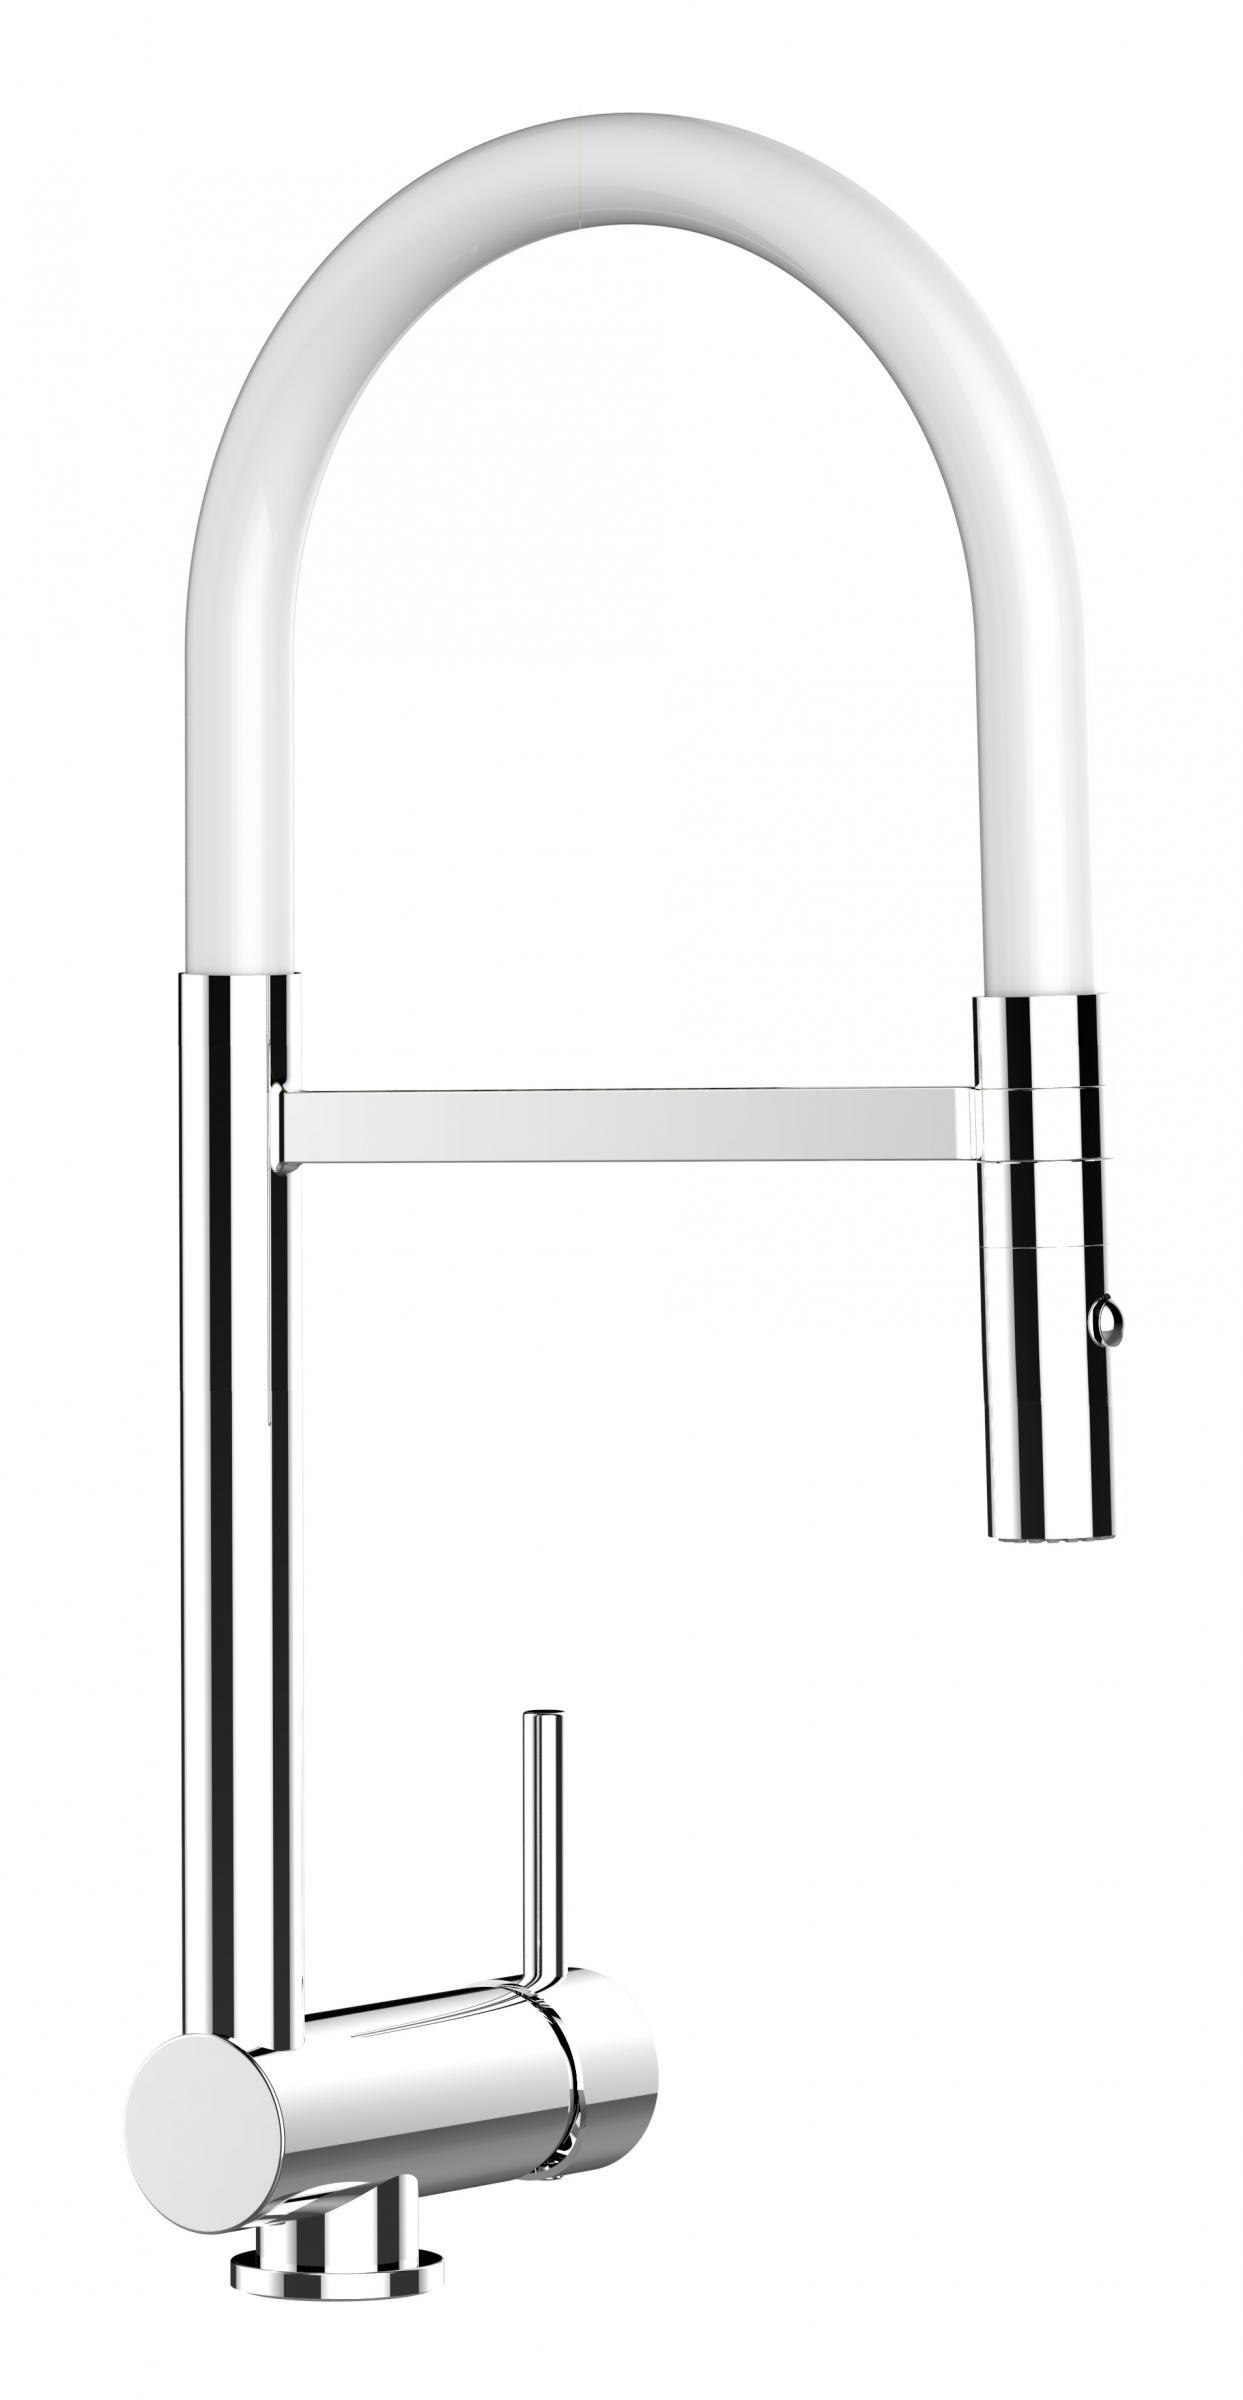 Full Size of Wasserhahn Küche Anschluss Wasserhahn Küche Ventil Wasserhahn Küche Warm Kalt Wasserhahn Küche Demontieren Küche Wasserhahn Küche